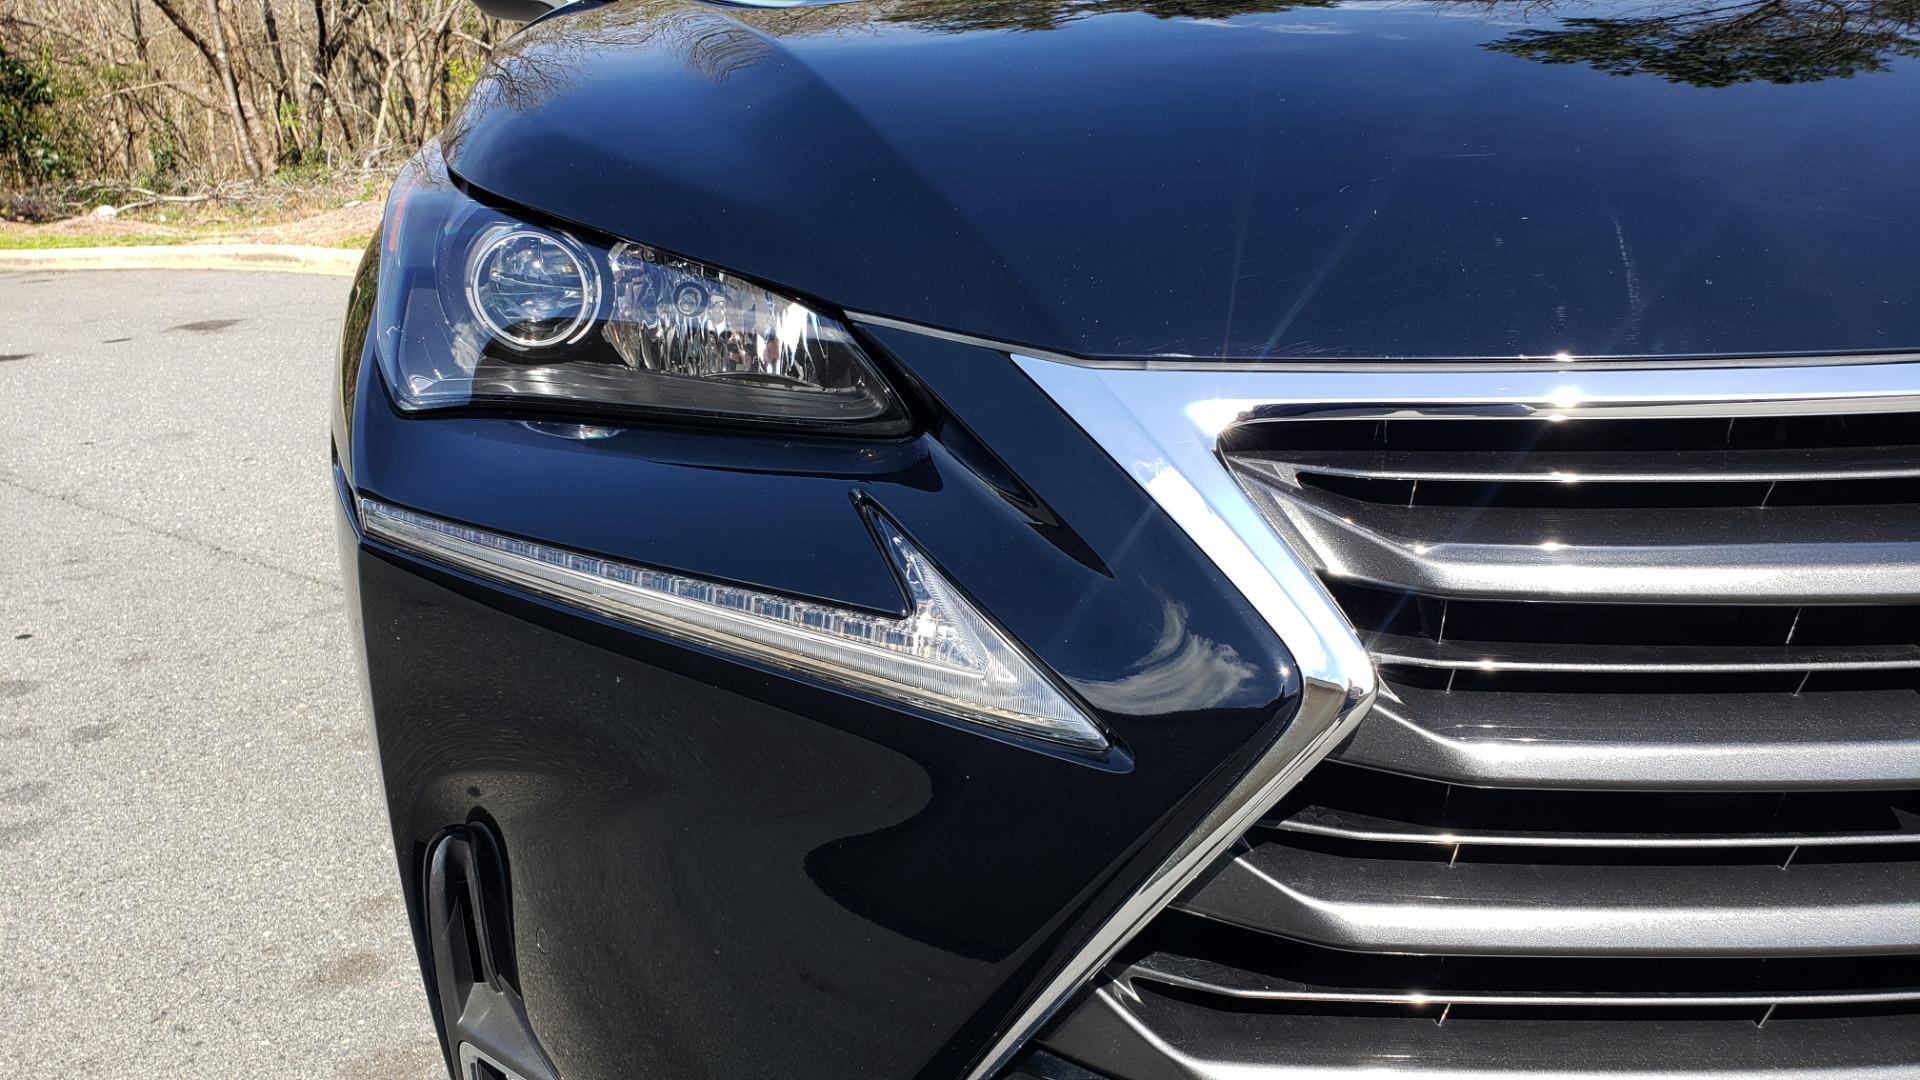 Used 2016 Lexus NX 200T PREM PKG / NAV / SUNROOF / PRE-COLLISION / PARK ASST for sale Sold at Formula Imports in Charlotte NC 28227 21